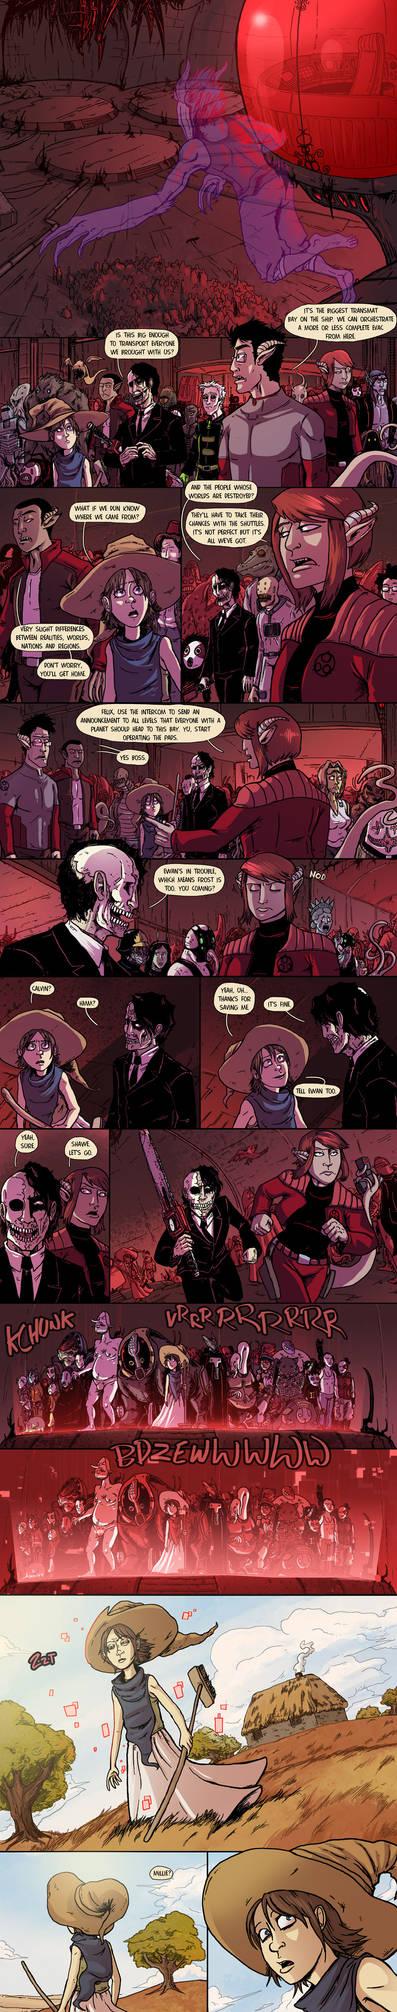 Ebon Spire Finale Page 7